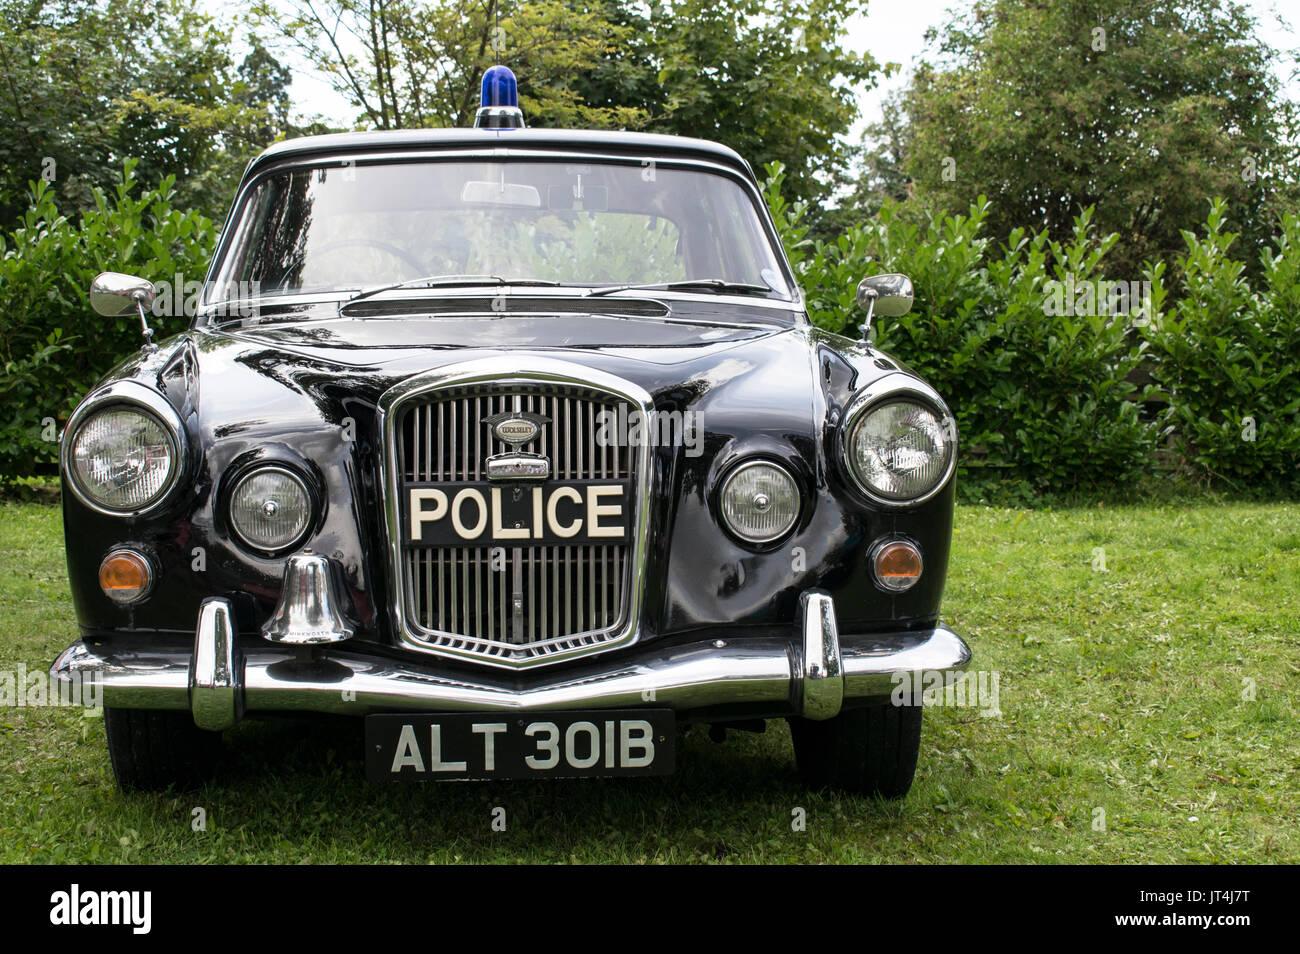 Classic Police Car Stock Photos Amp Classic Police Car Stock Images Alamy